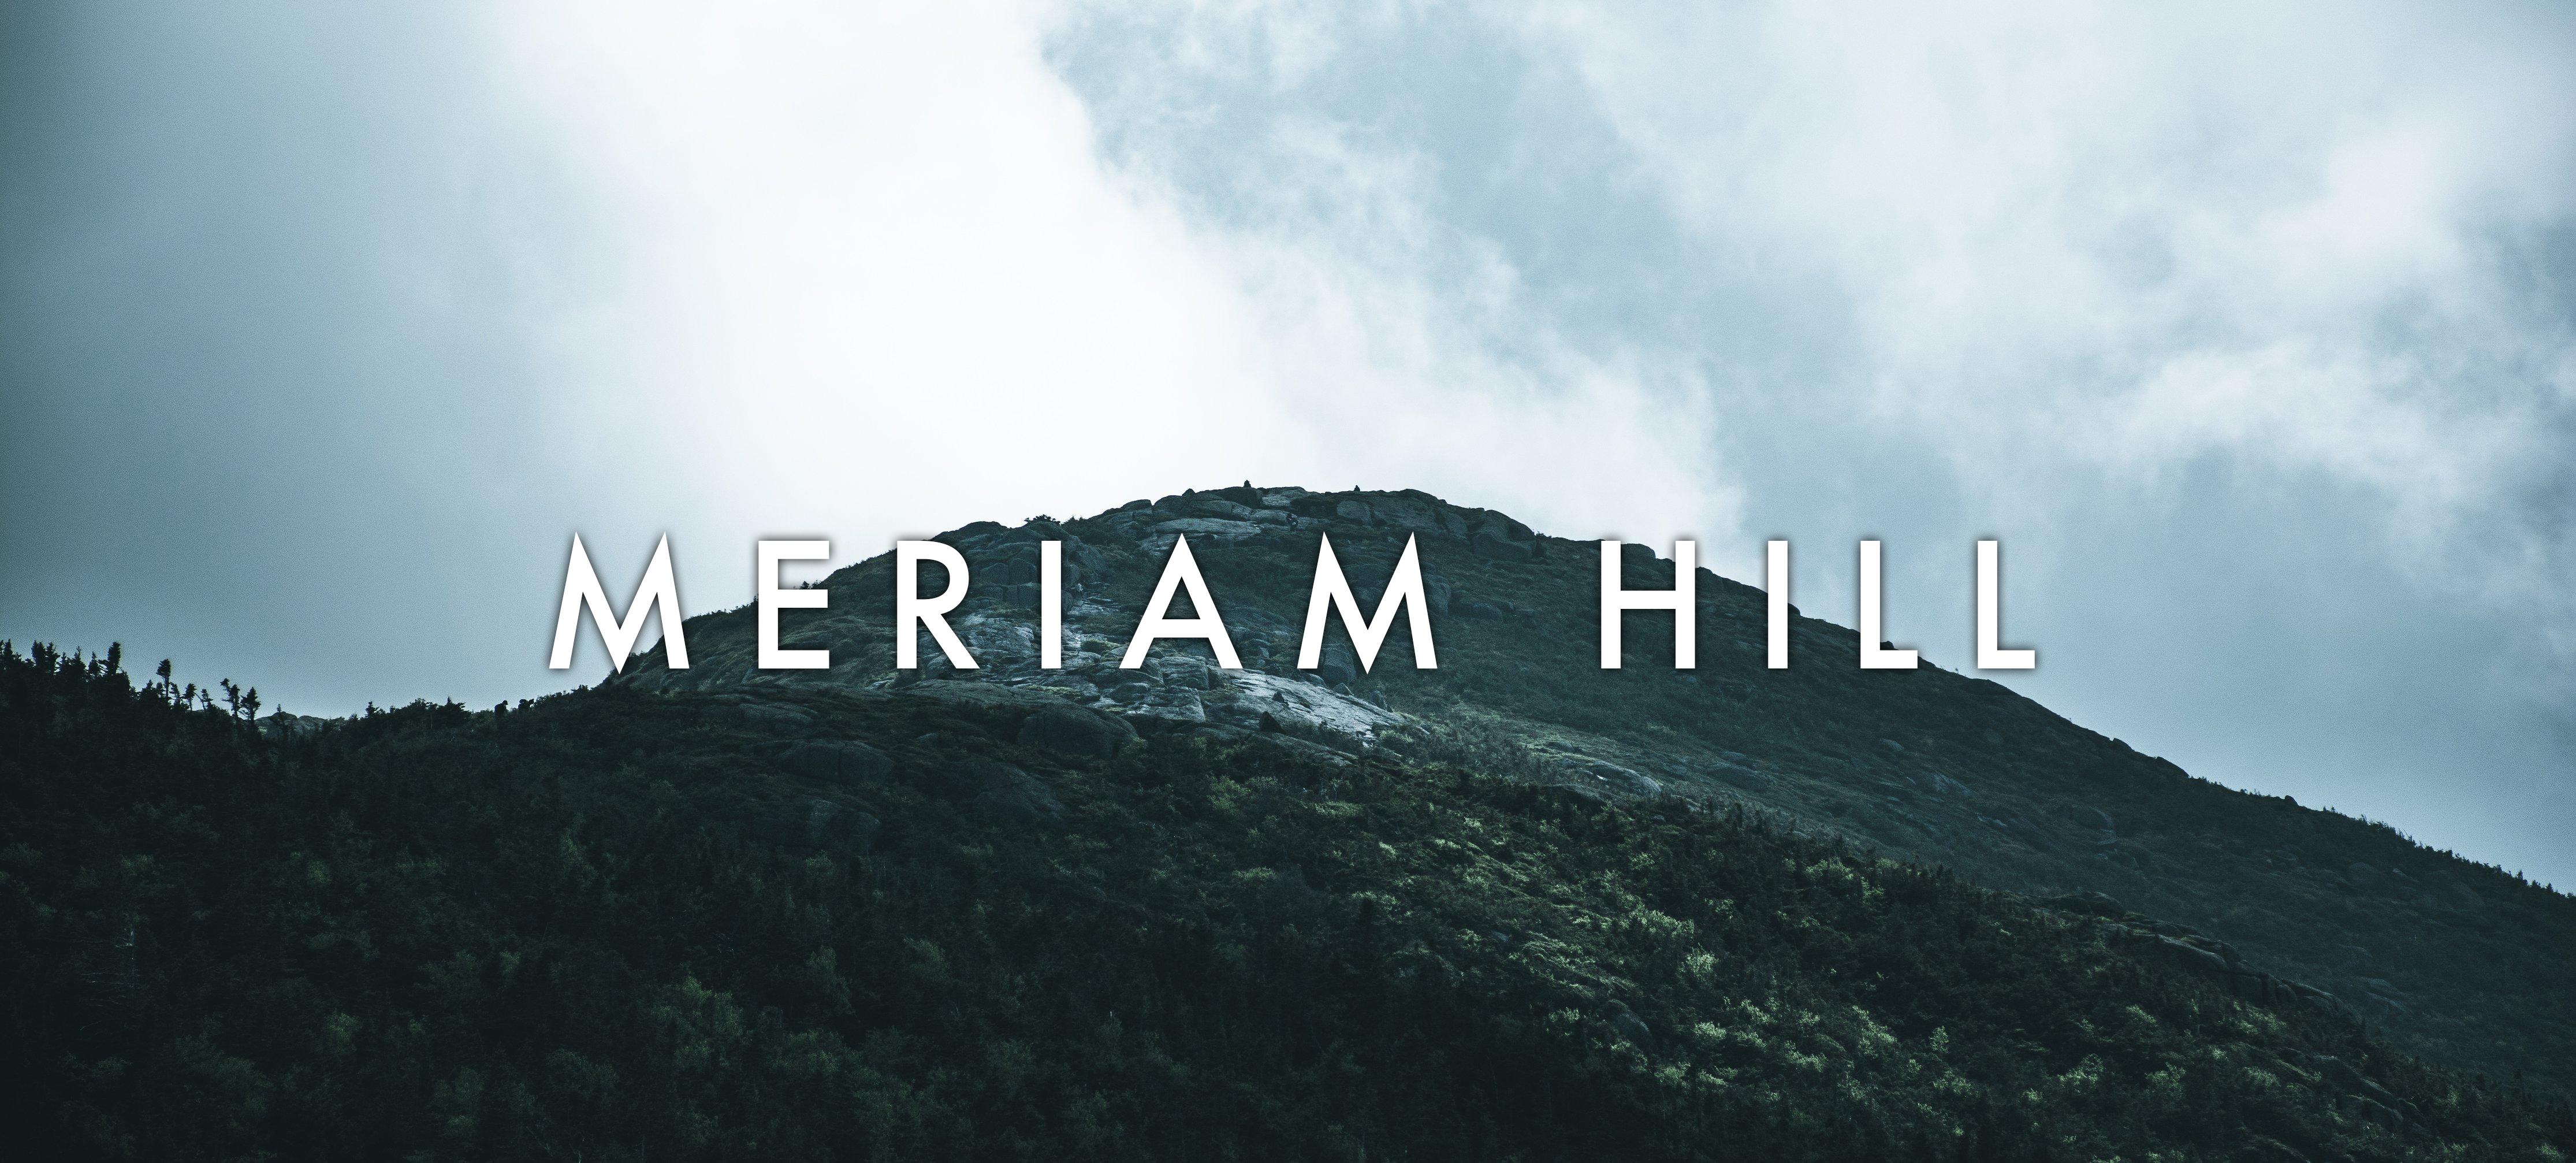 meriam hill, lexington, ma